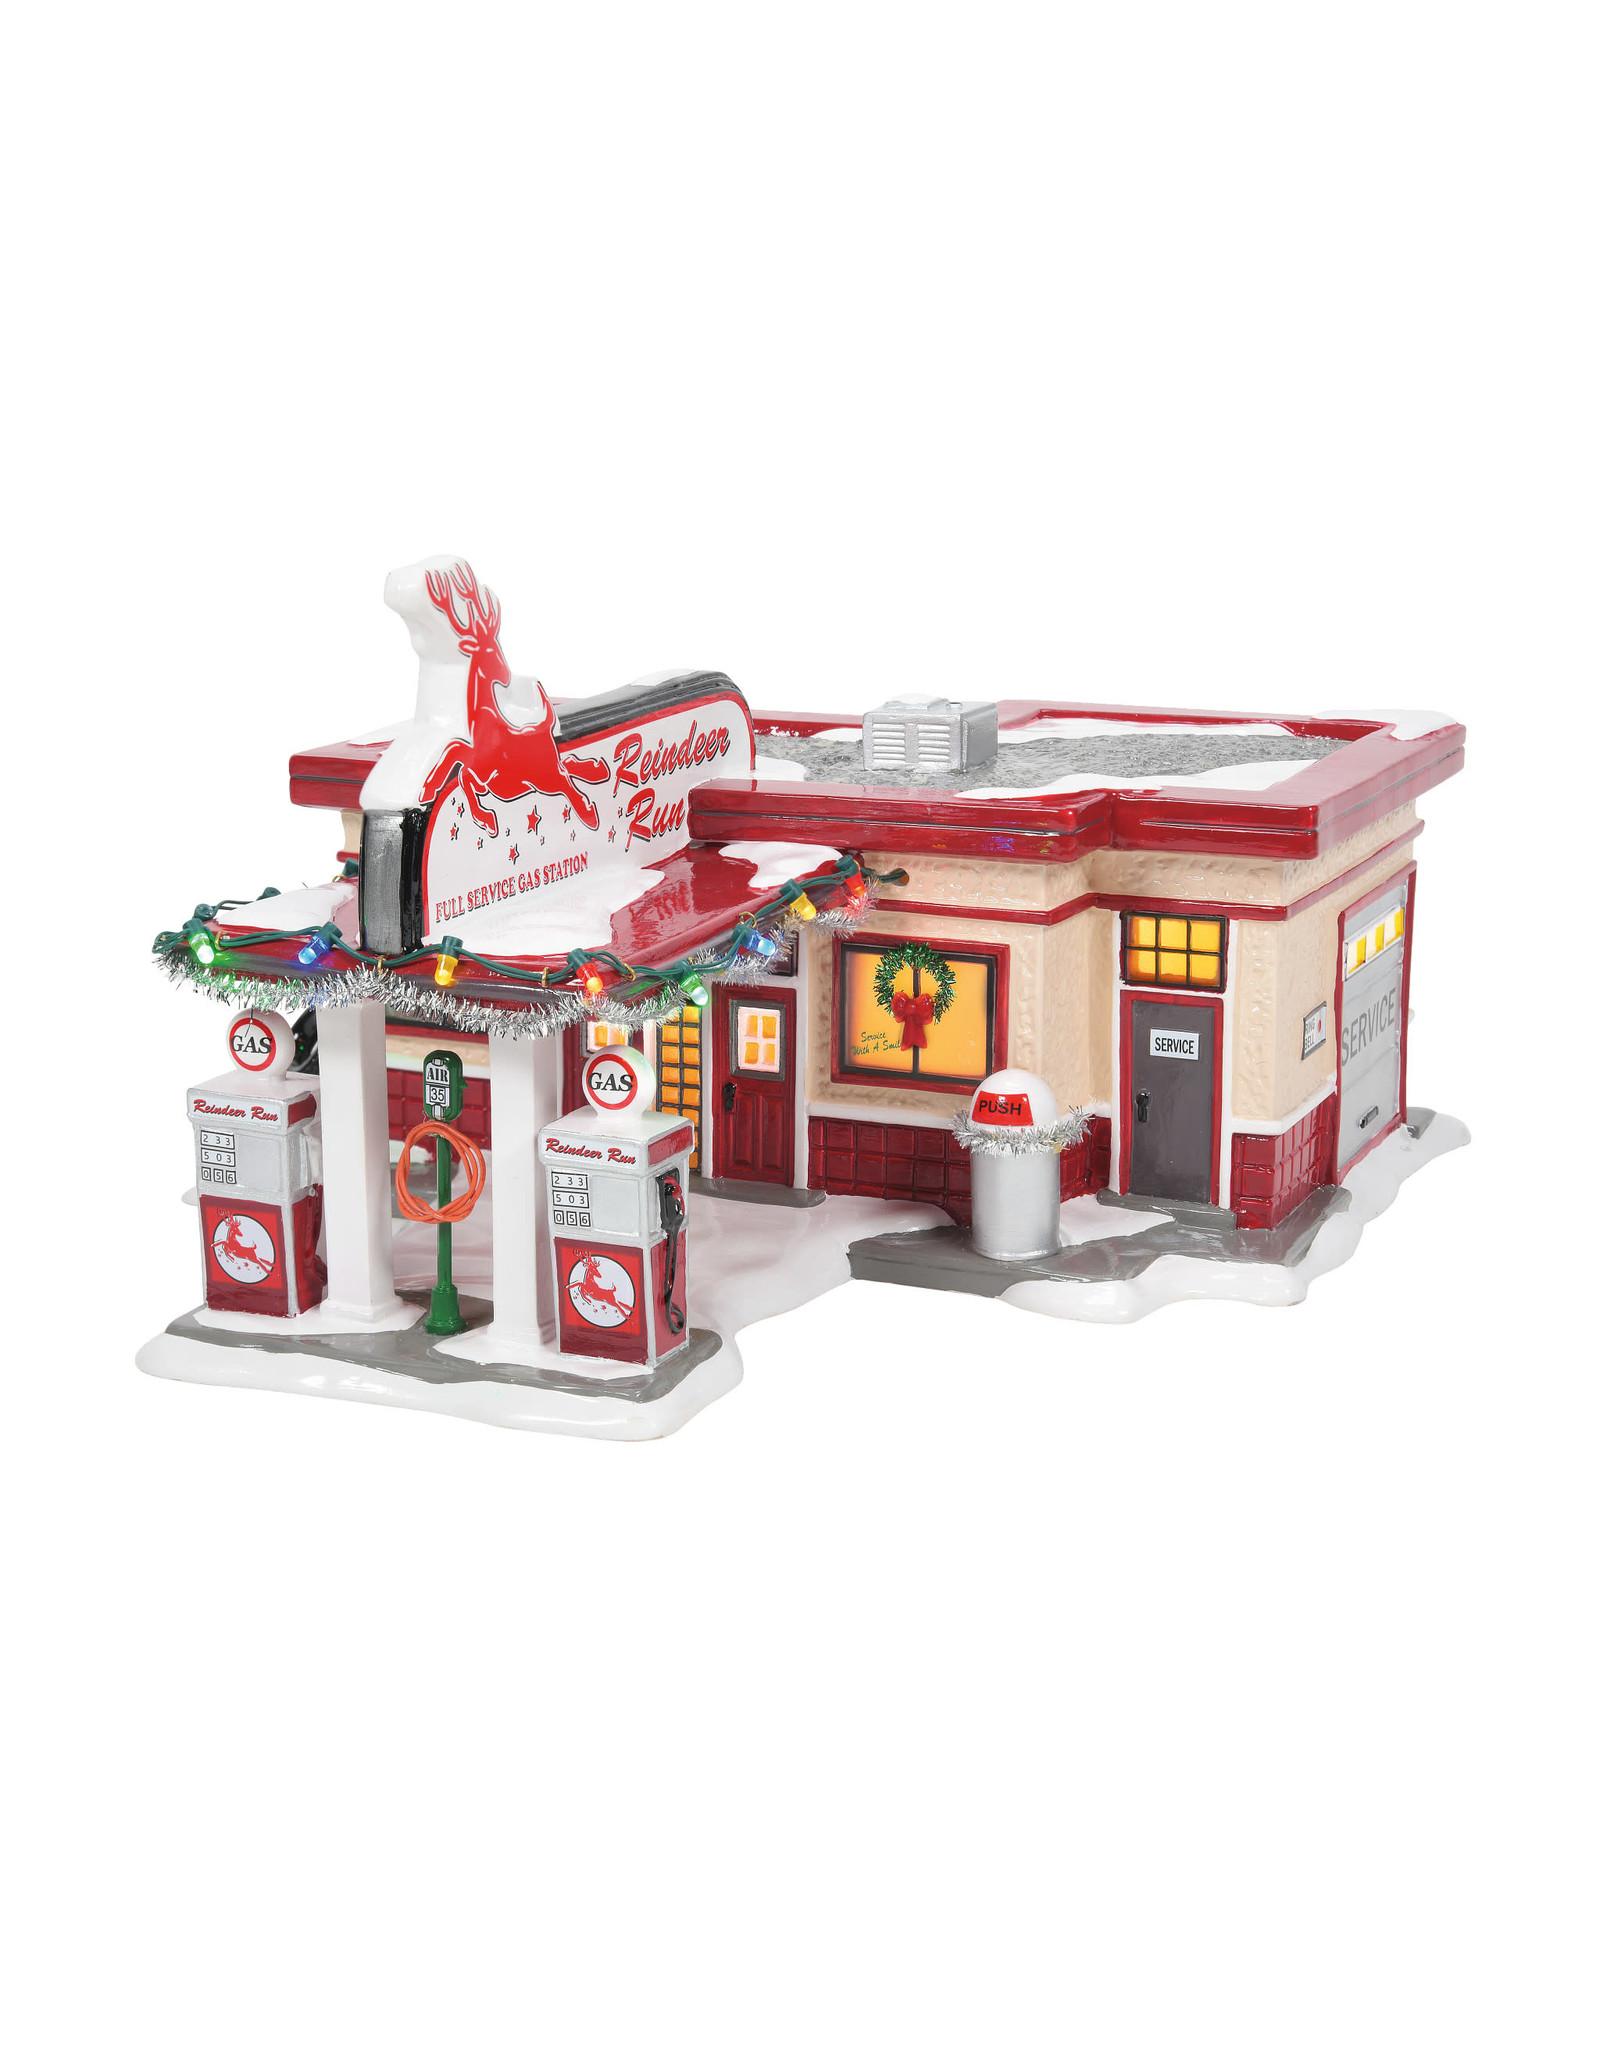 Department 56 Reindeer Gas Station